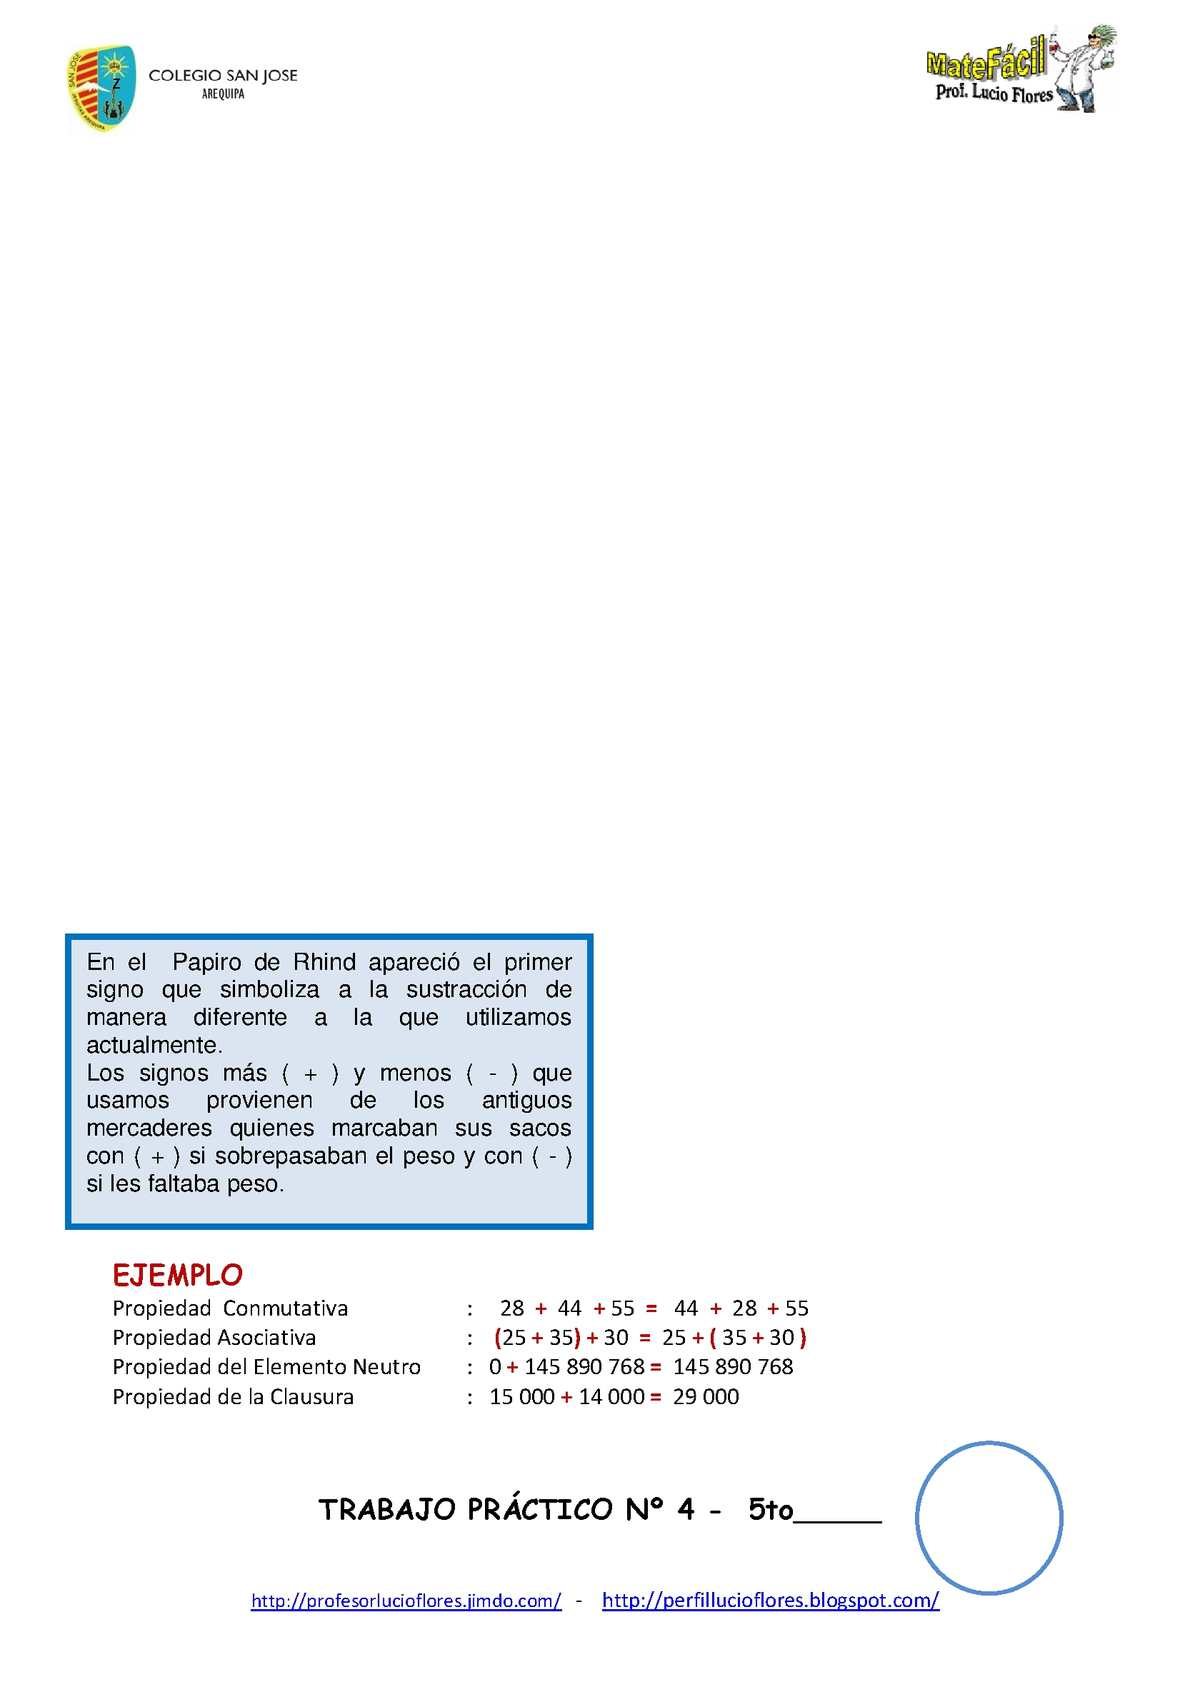 Libro Digital de Matemática 5to de primaria - Lucio Flores - CALAMEO ...